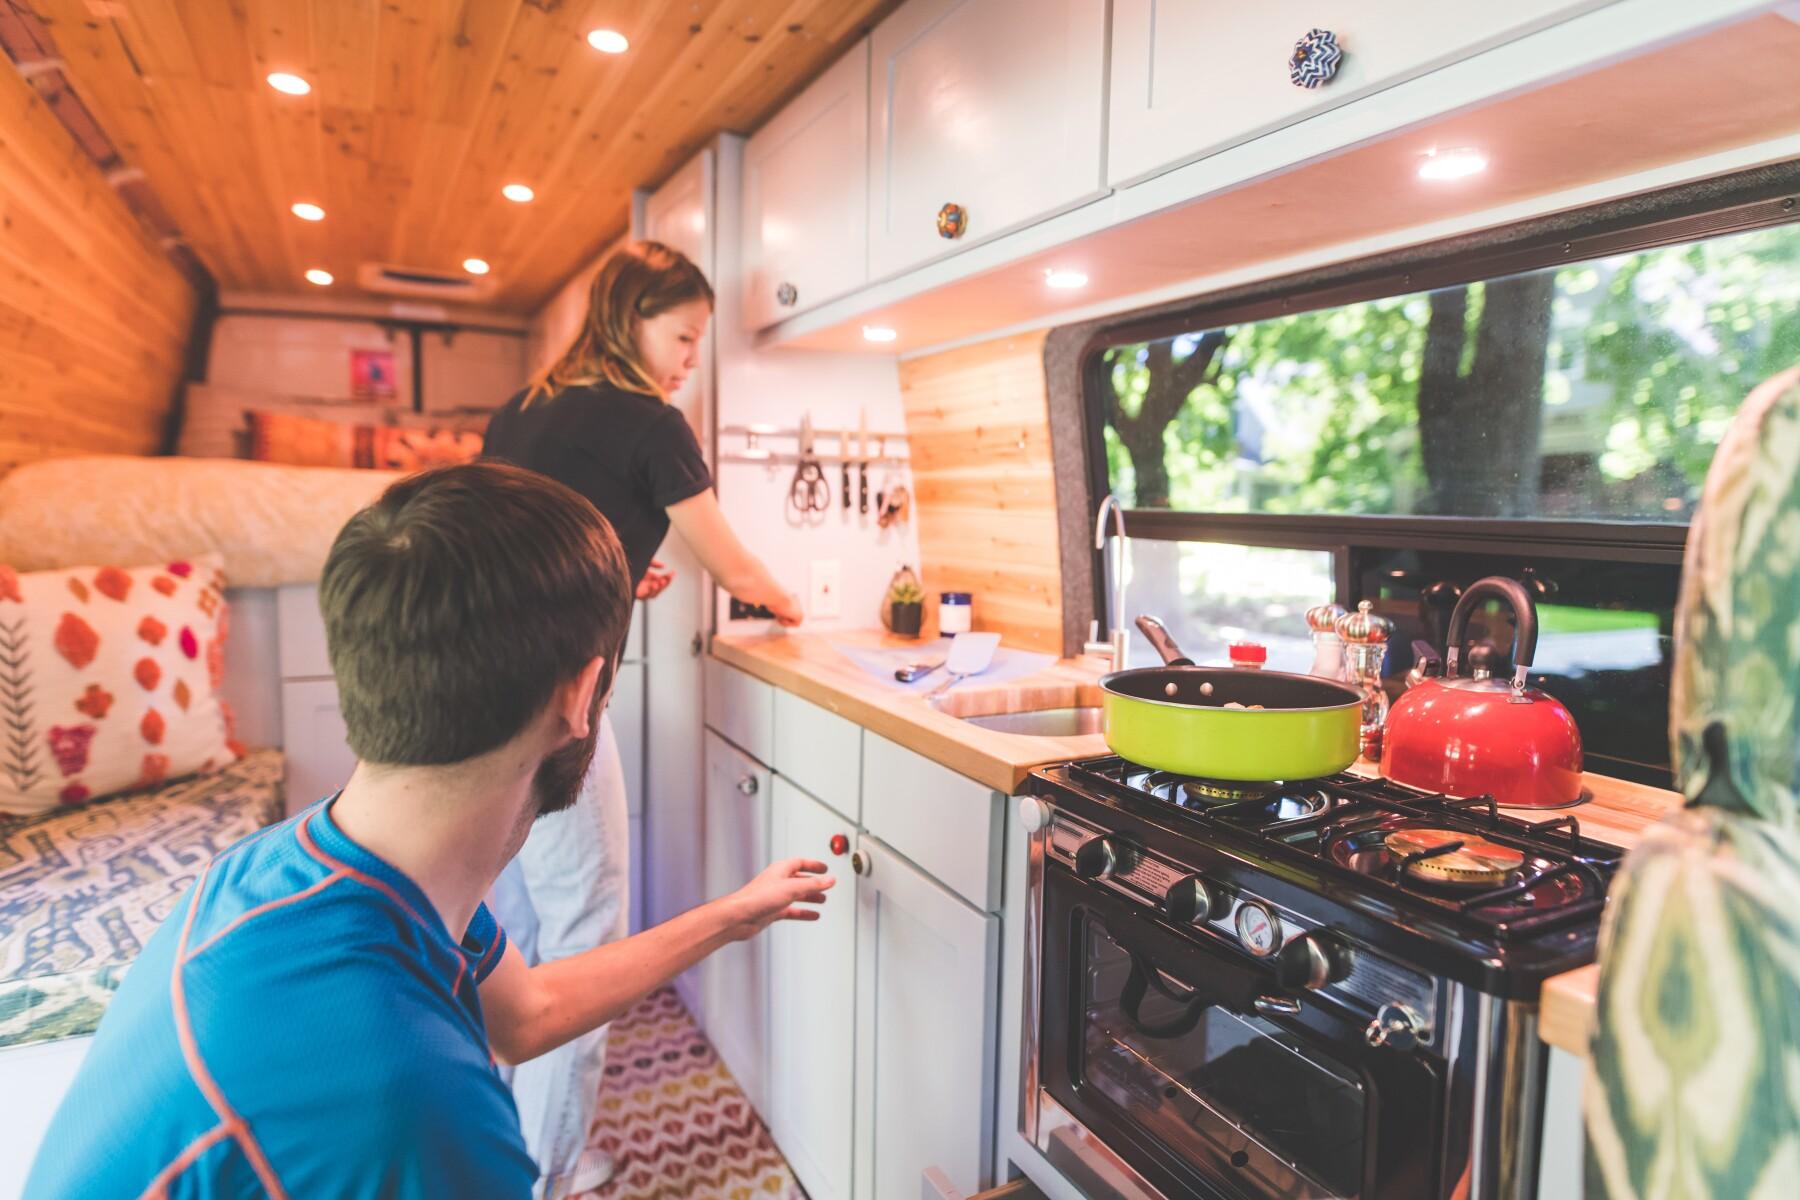 Millennial couple cook breakfast in the van they live in